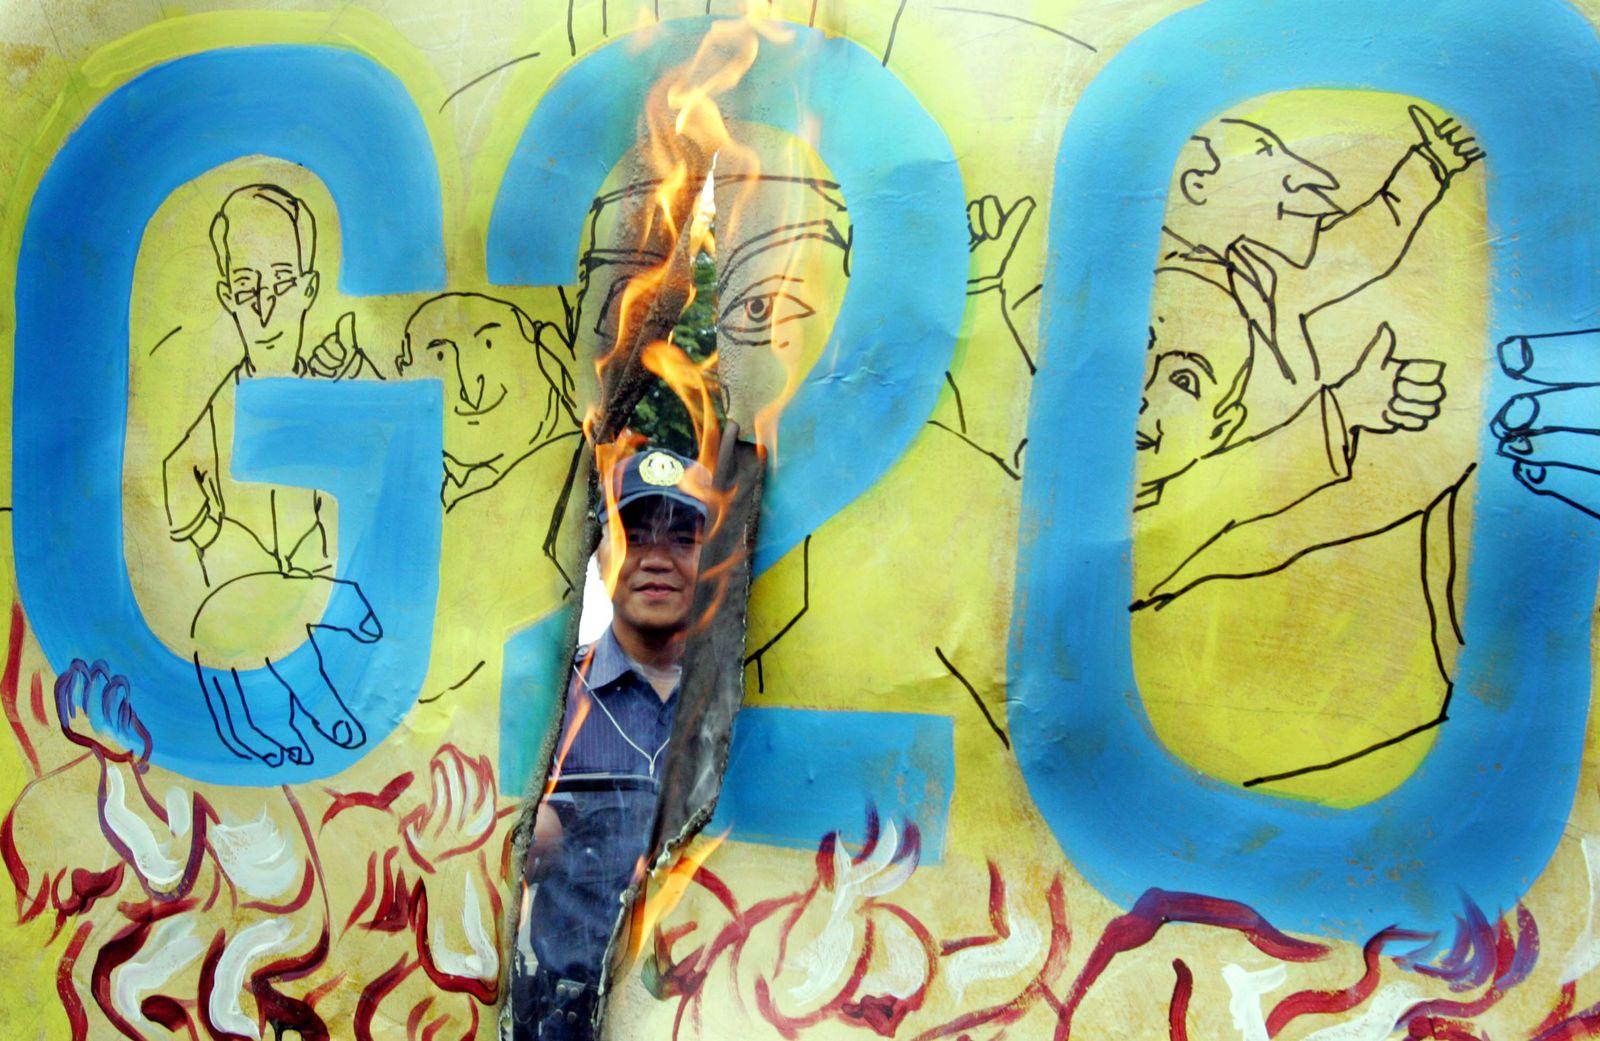 Philippines G-20 Protest